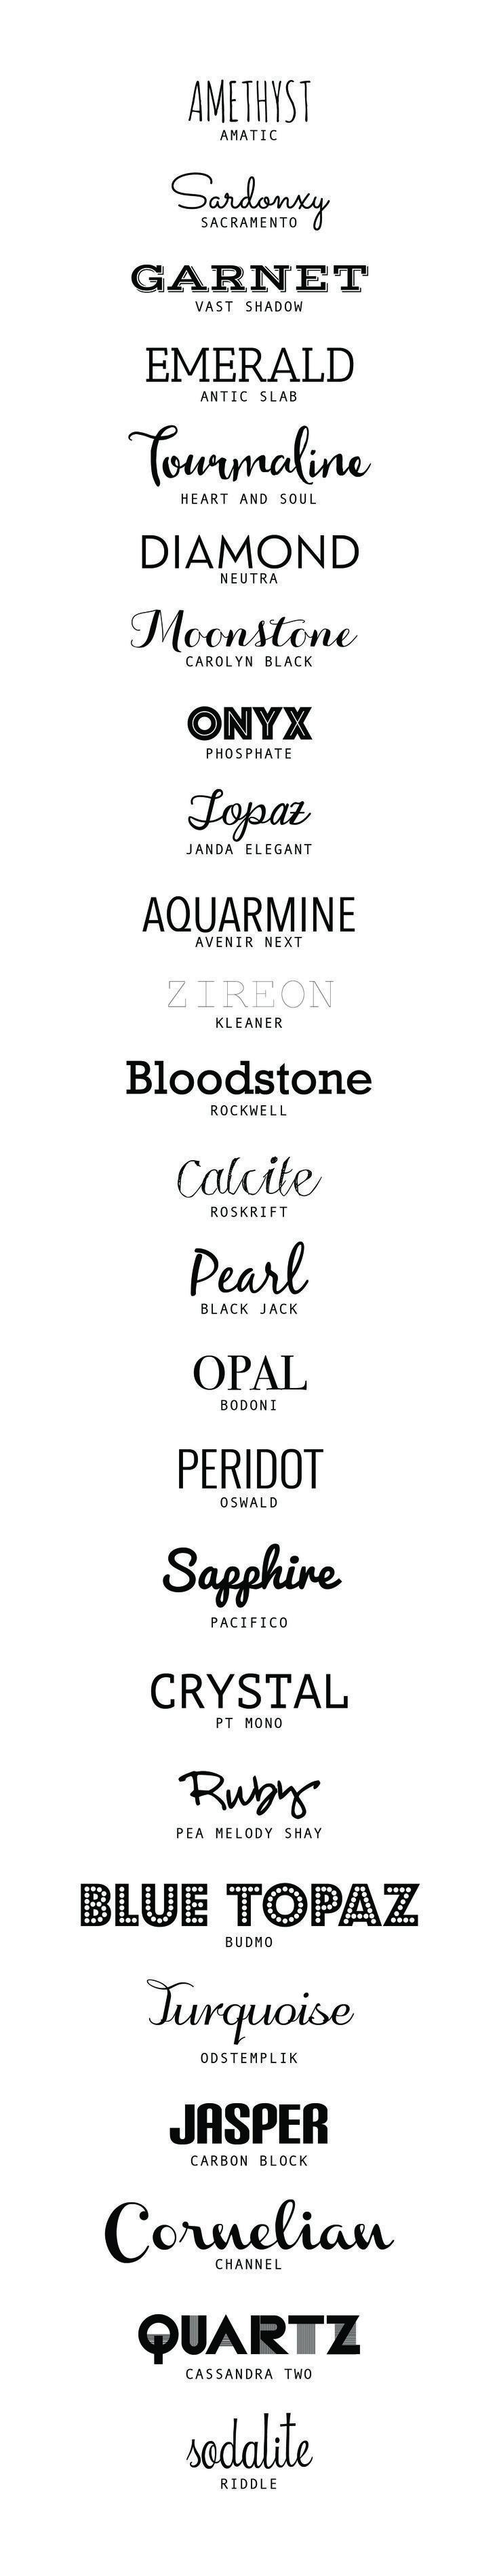 25 of the best Free Fonts | http://desireedreszer.com